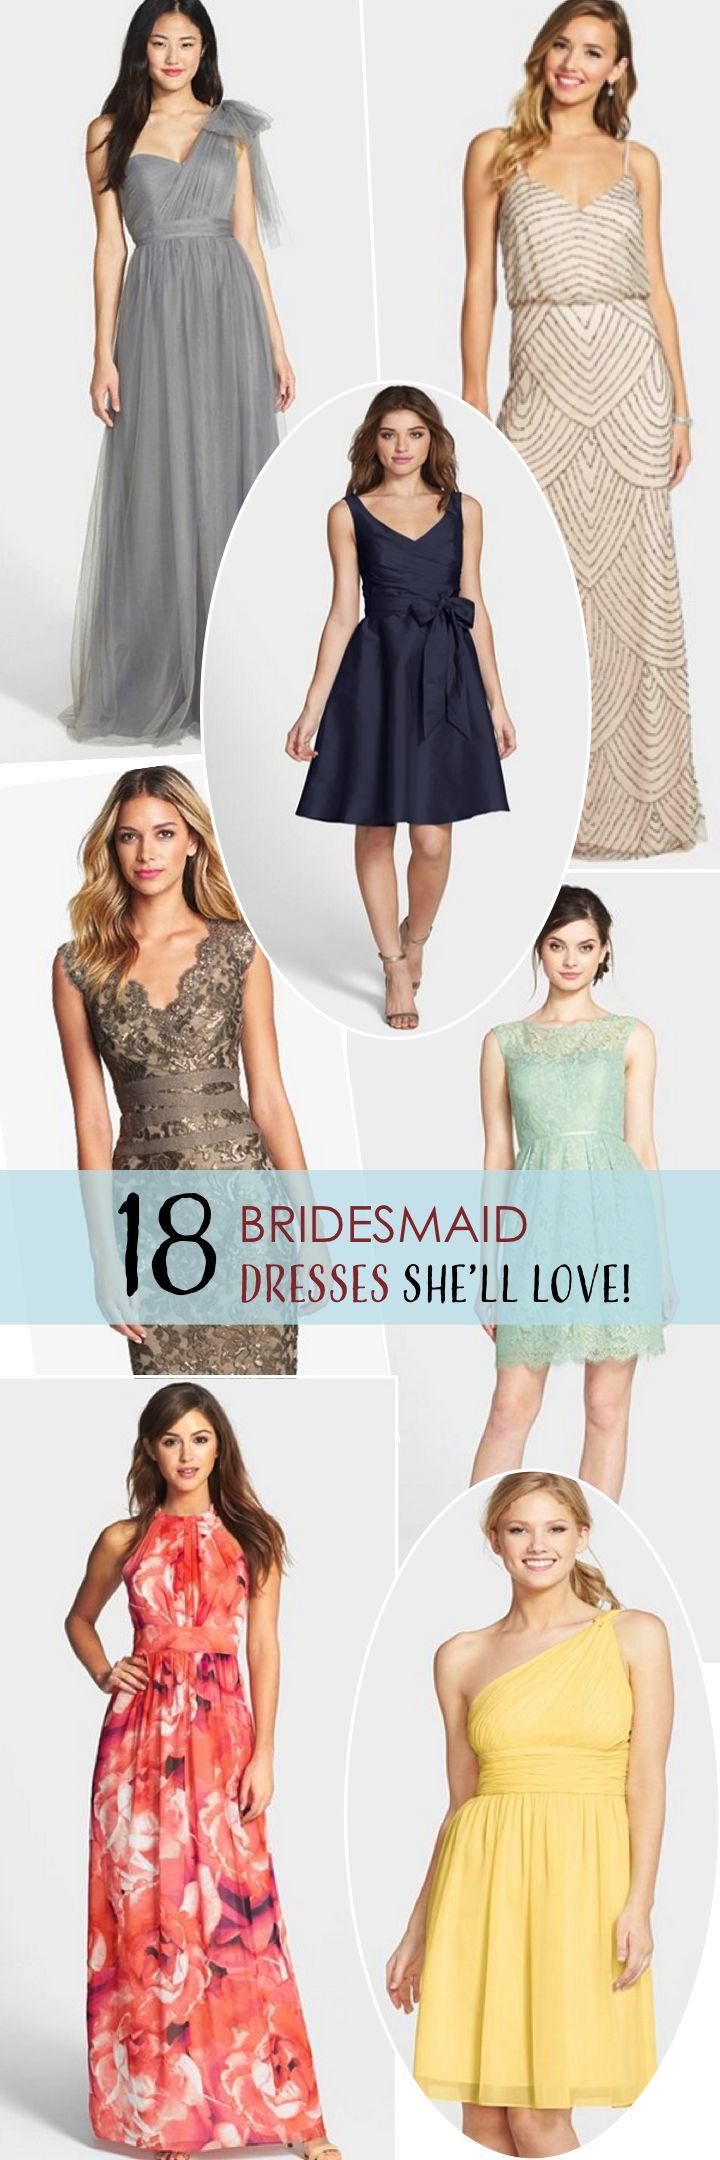 1914 best bridesmaid dresses images on pinterest boyfriends 18 bridesmaid dresses shell love ombrellifo Gallery